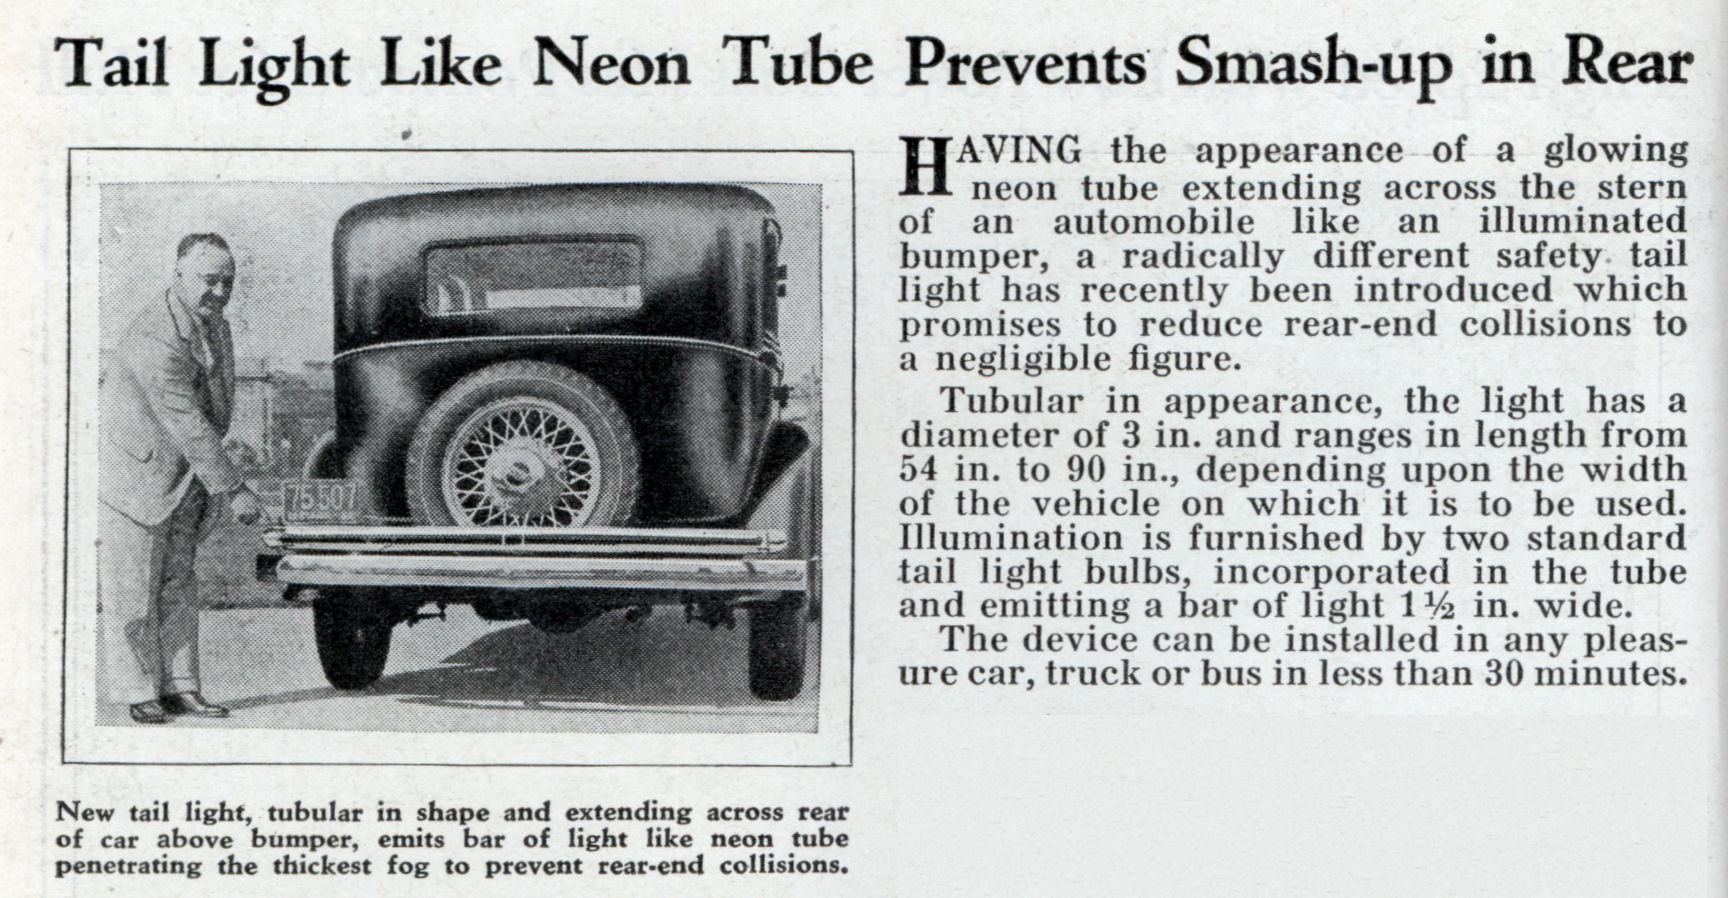 Tail Light Like Neon Tube